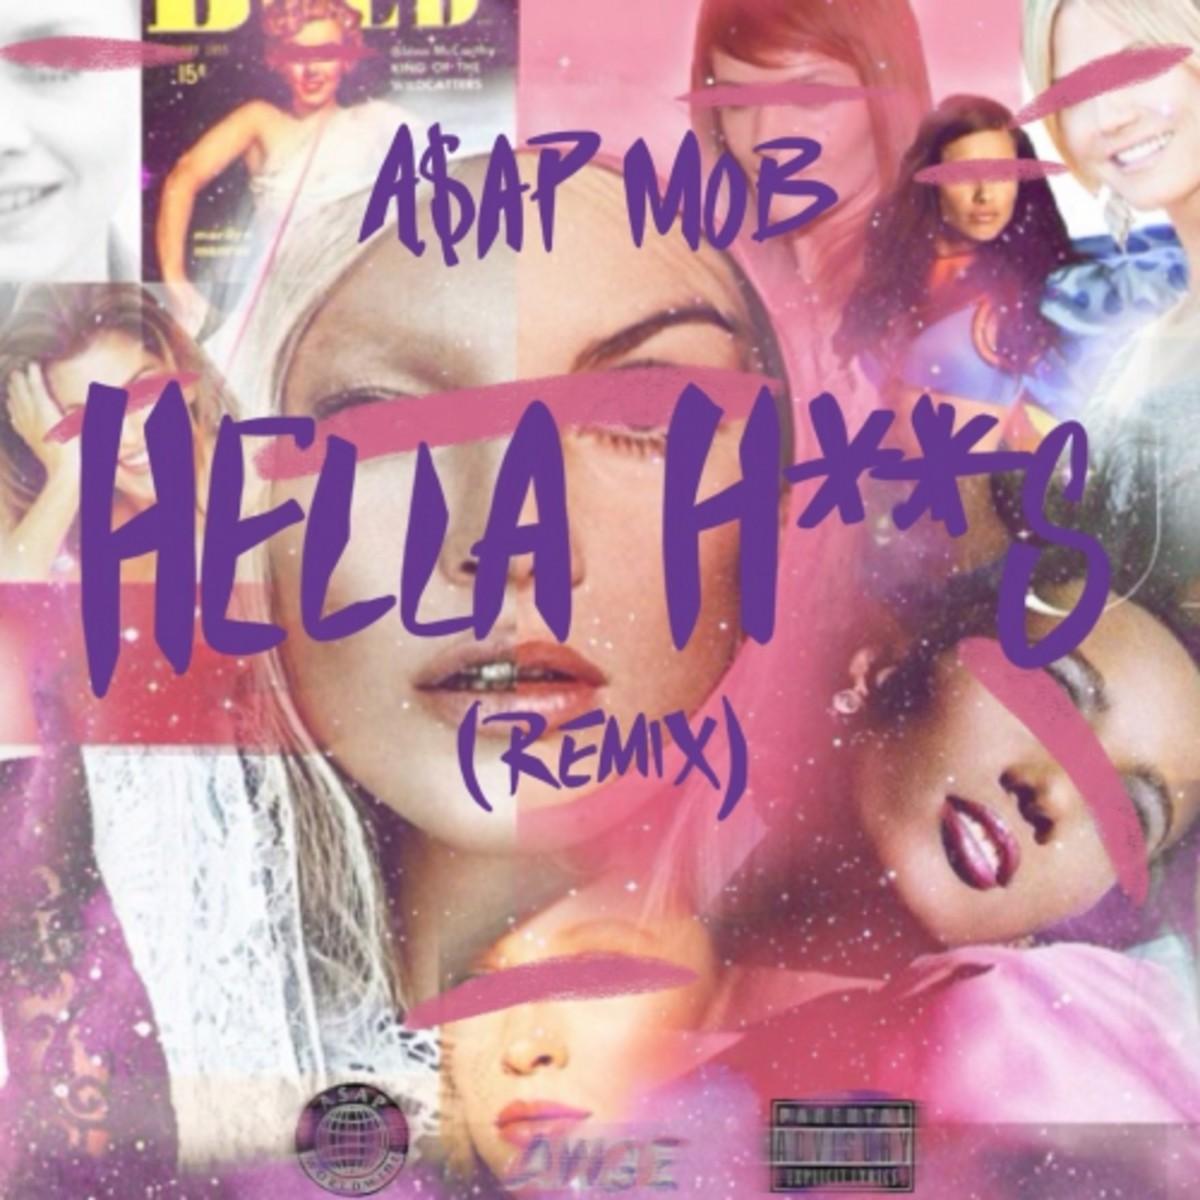 asap-mob-hella-hoes-remix.jpg